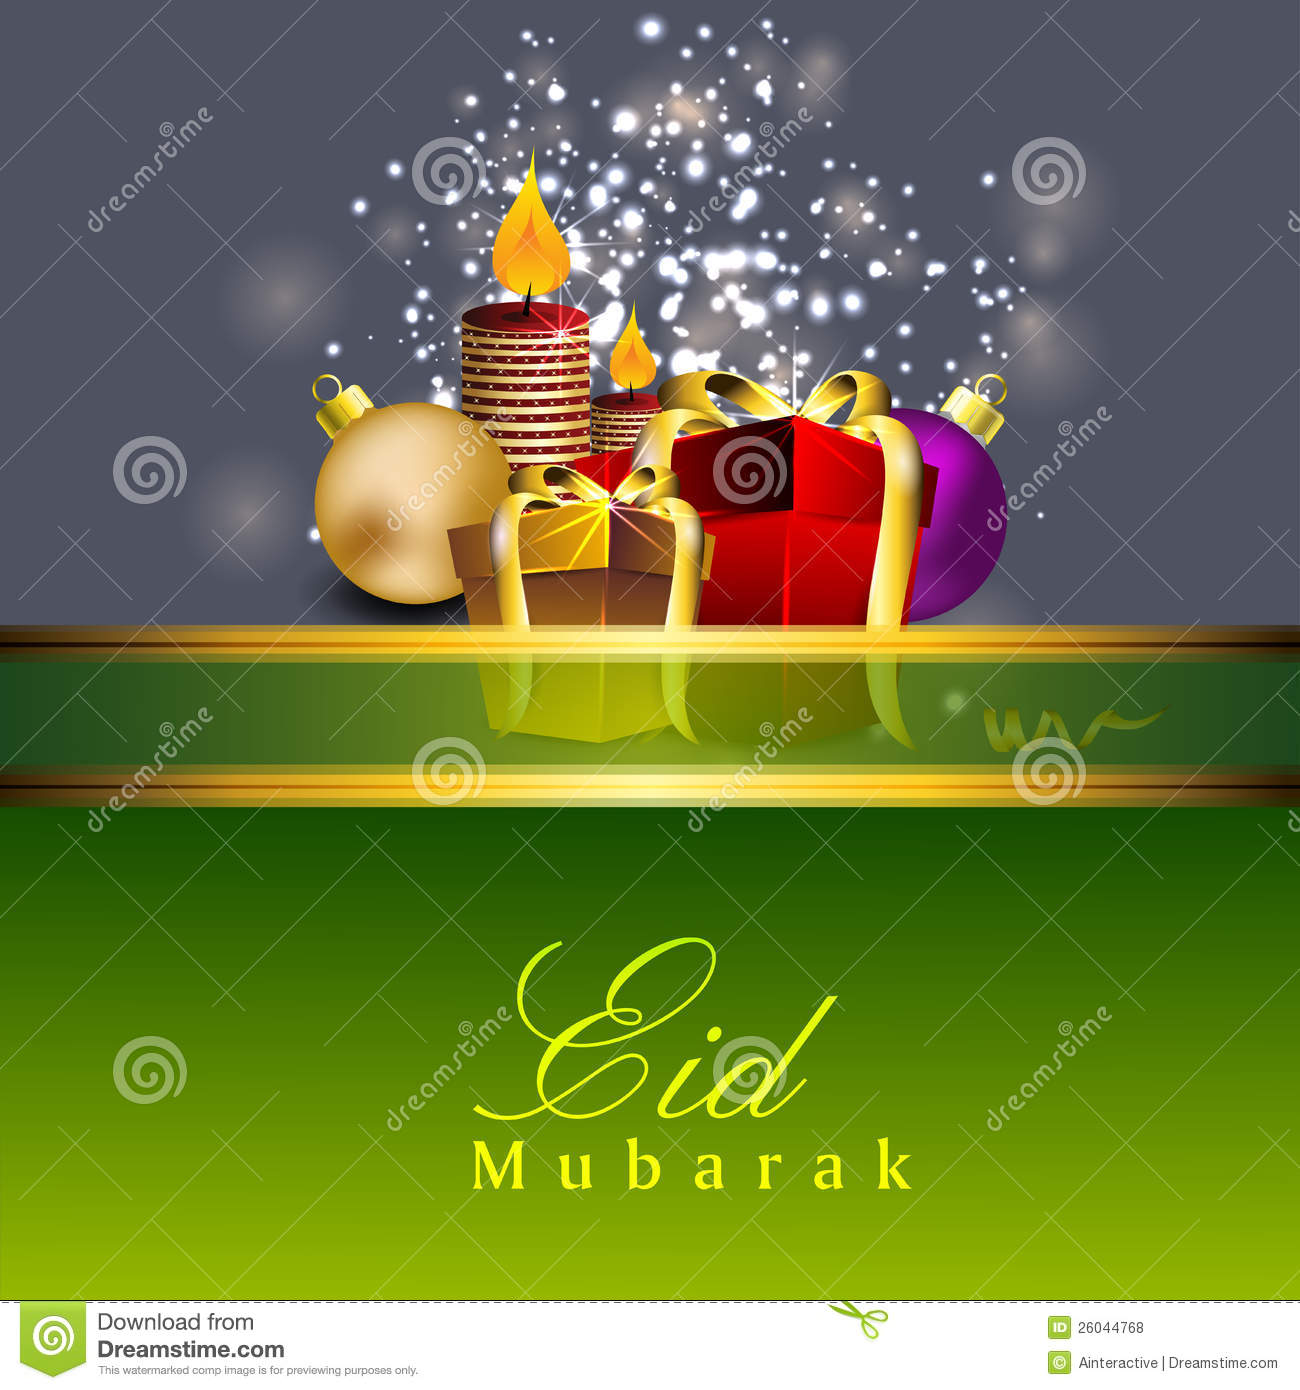 Popular eid mubarak greetings cards most selected eid mubarak eid mubarak cards music kristyandbryce Choice Image